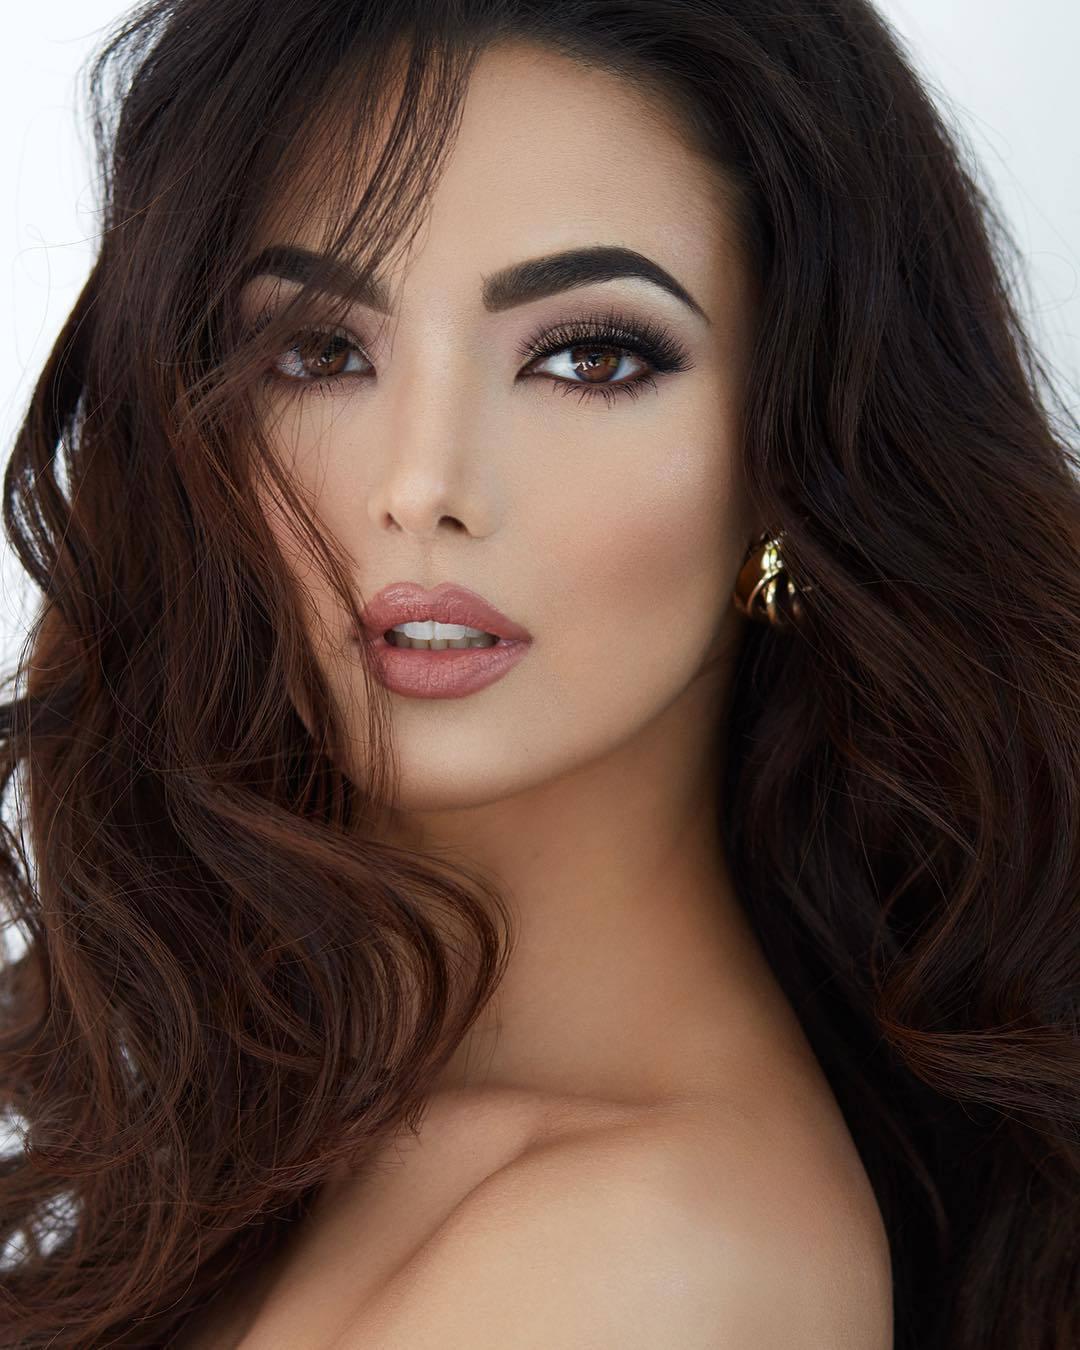 alejandra gonzalez, top 2 de miss usa 2019. 51177598_1178068419014206_279102904252127610_n